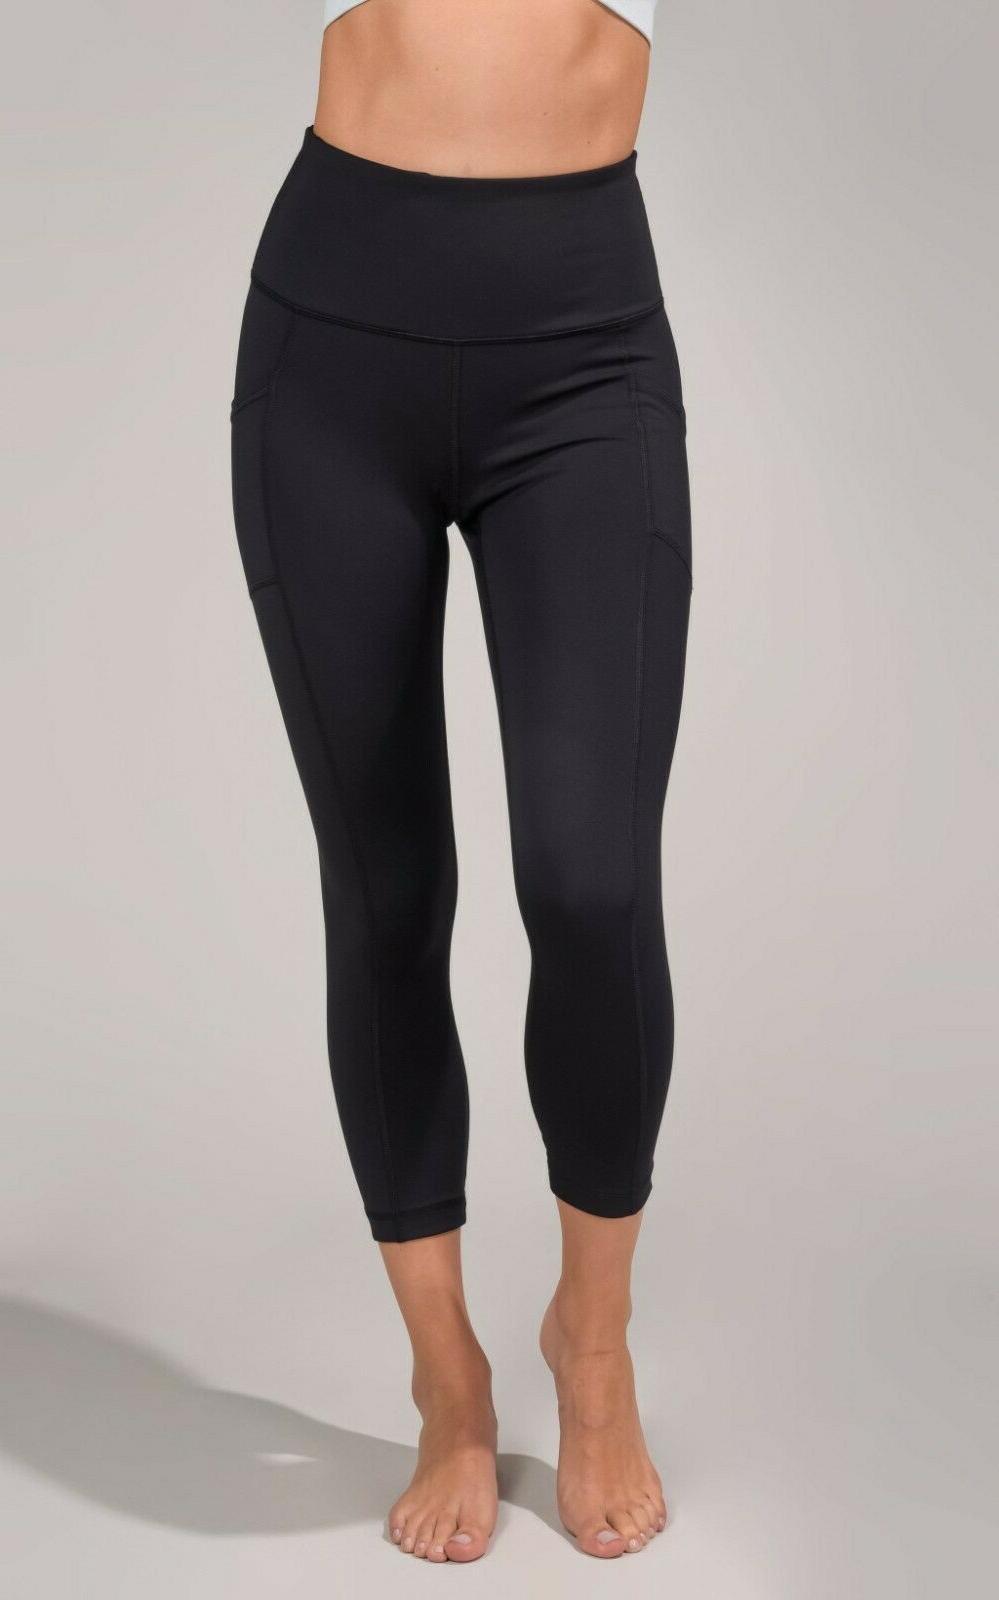 NEW Degree Reflex Waist Pocket Capri Leggings Pants